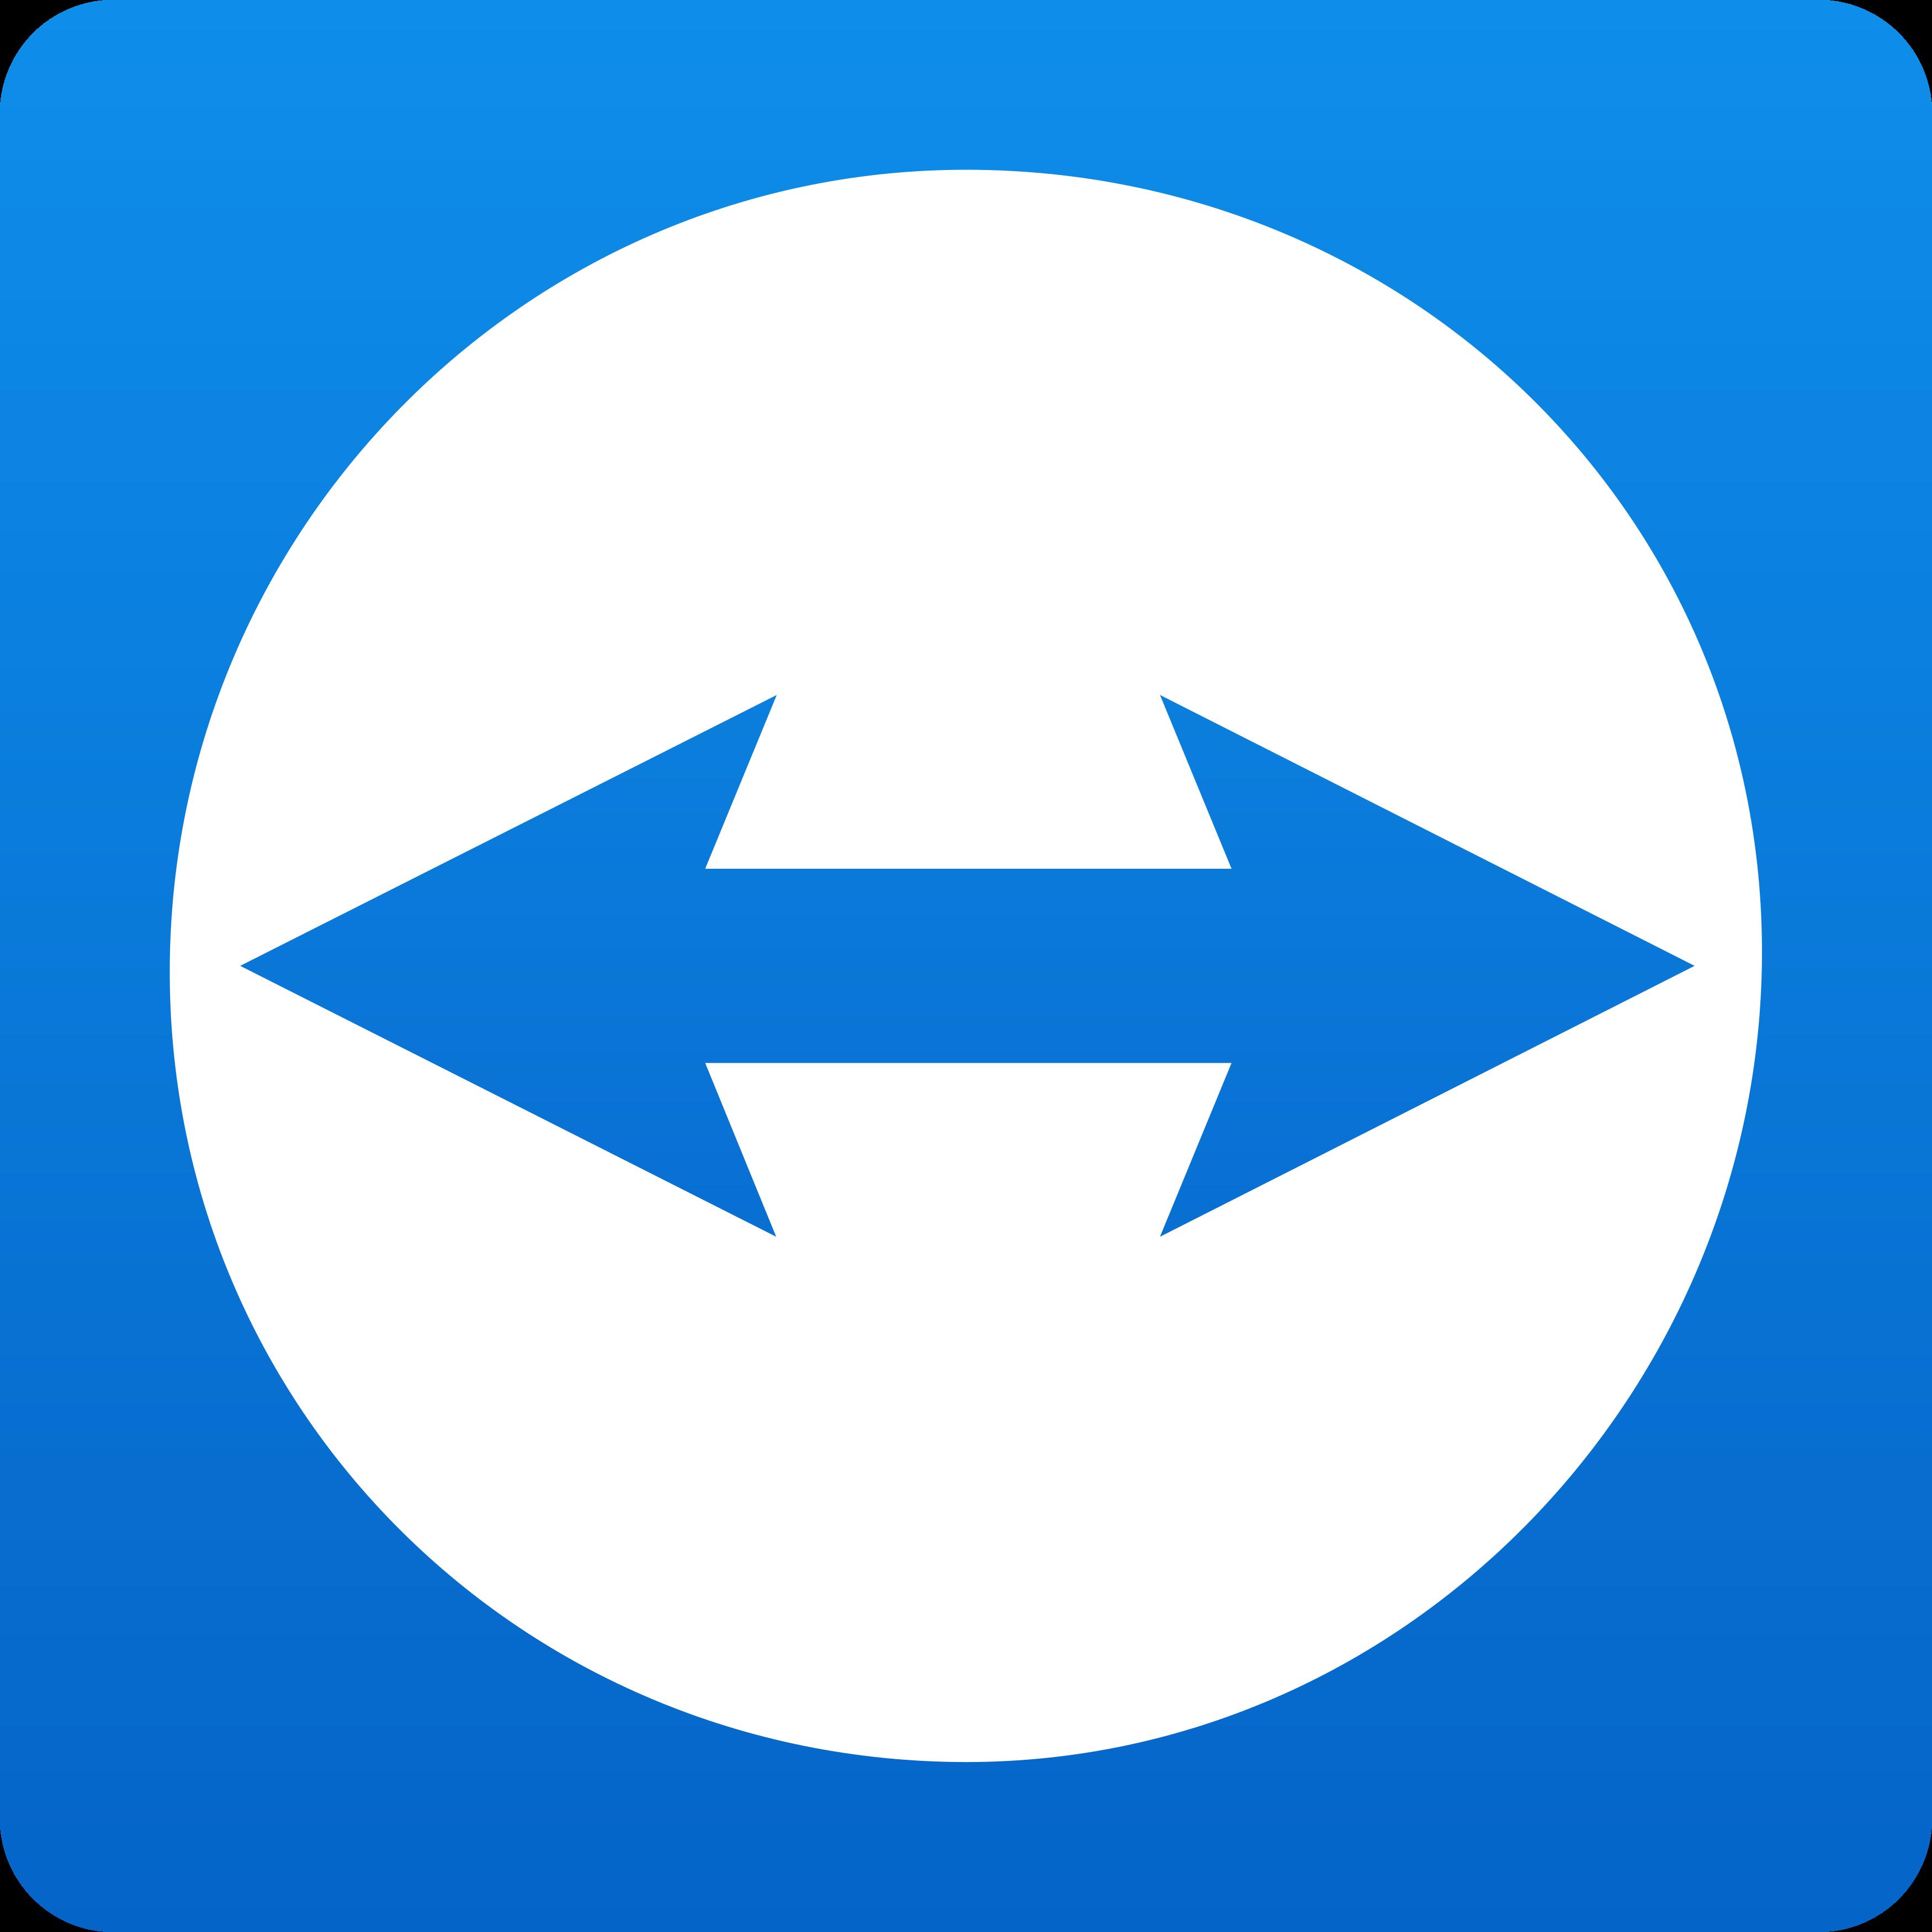 teamviewer-logo-0